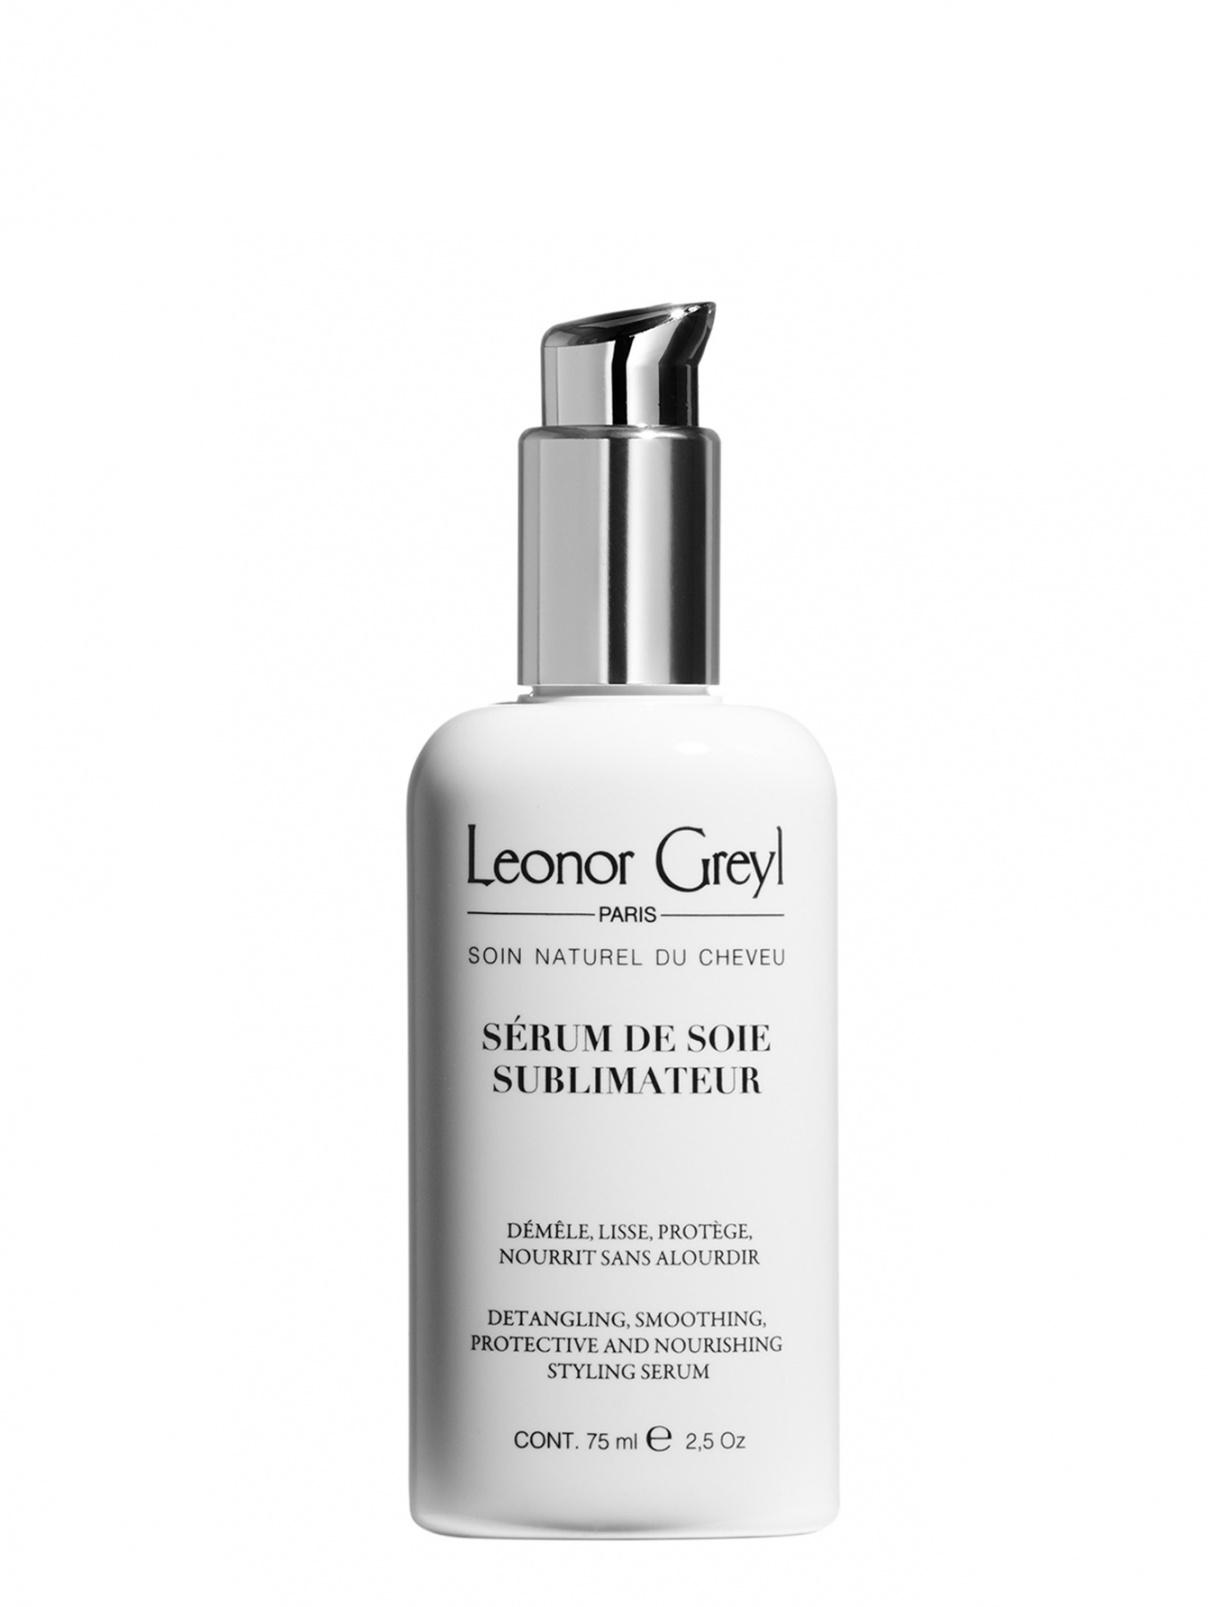 Сыворотка для укладки - Hair Care, 75ml Leonor Greyl  –  Общий вид